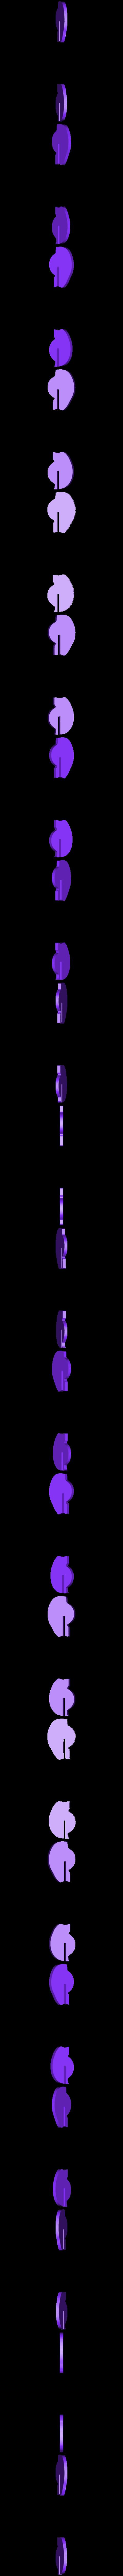 cars-Slice-2.stl Download free STL file Puzzle car • 3D printing template, tyh